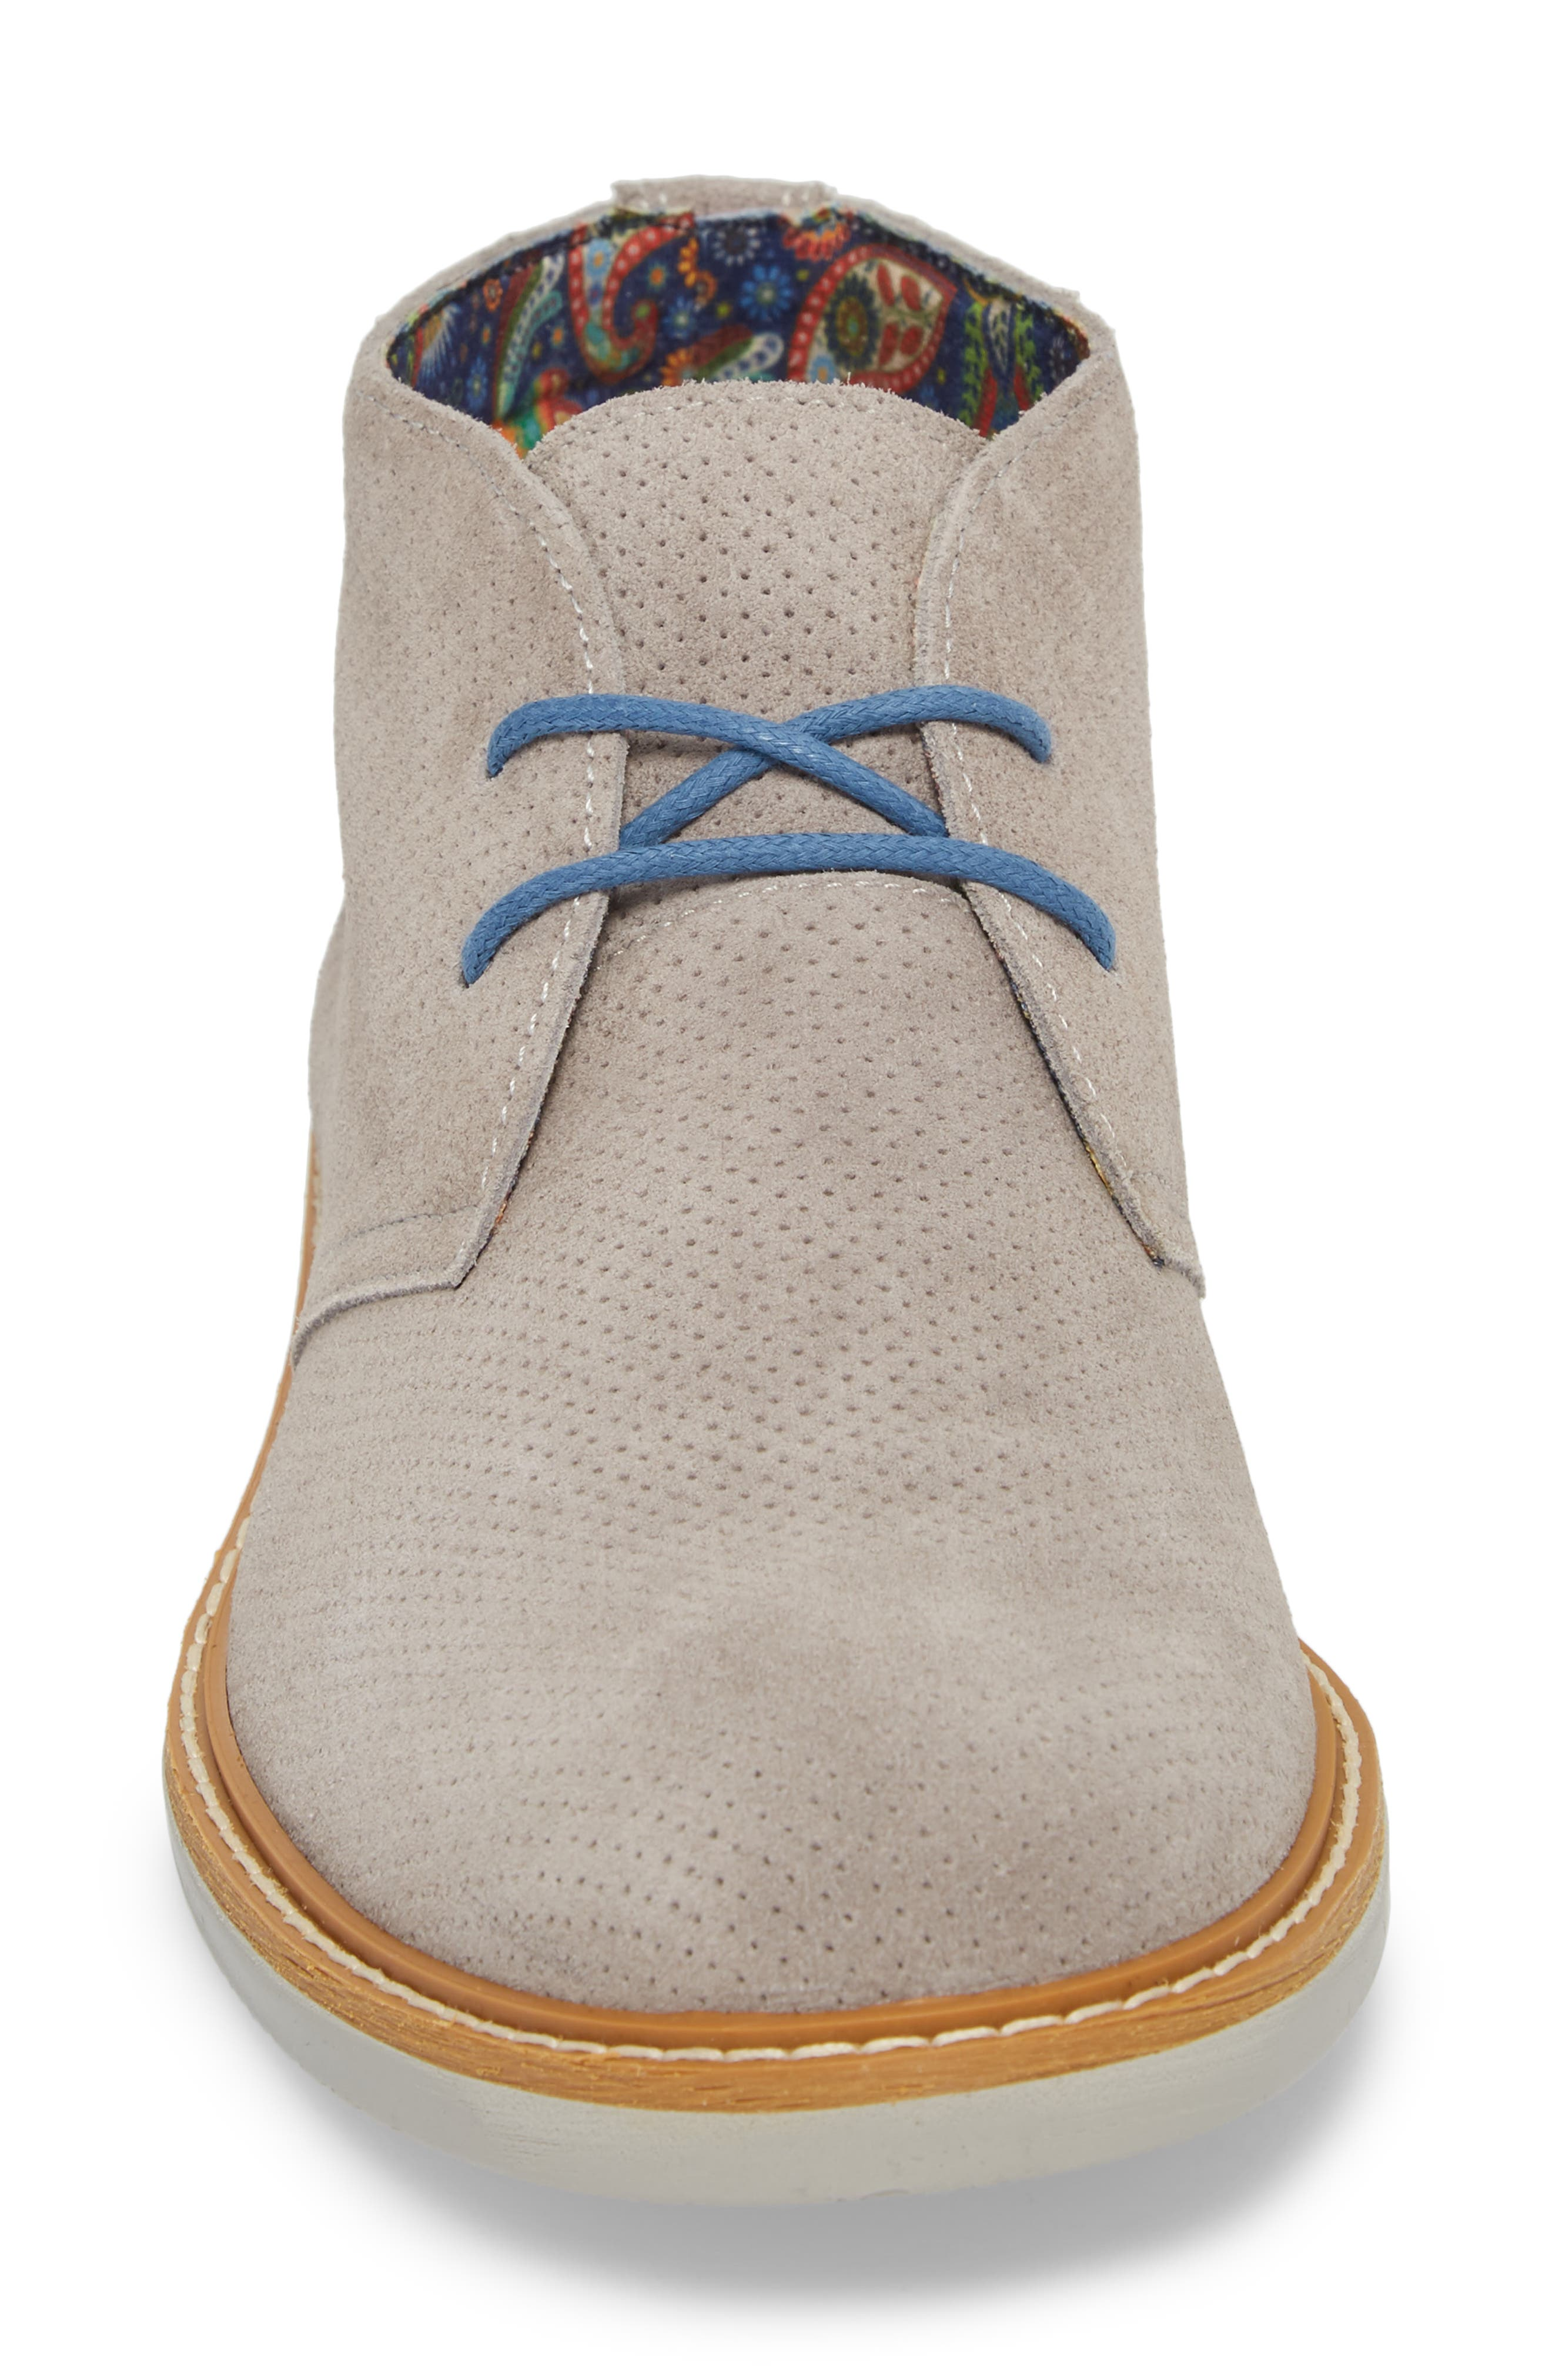 Bayside Perforated Chukka Boot,                             Alternate thumbnail 4, color,                             020